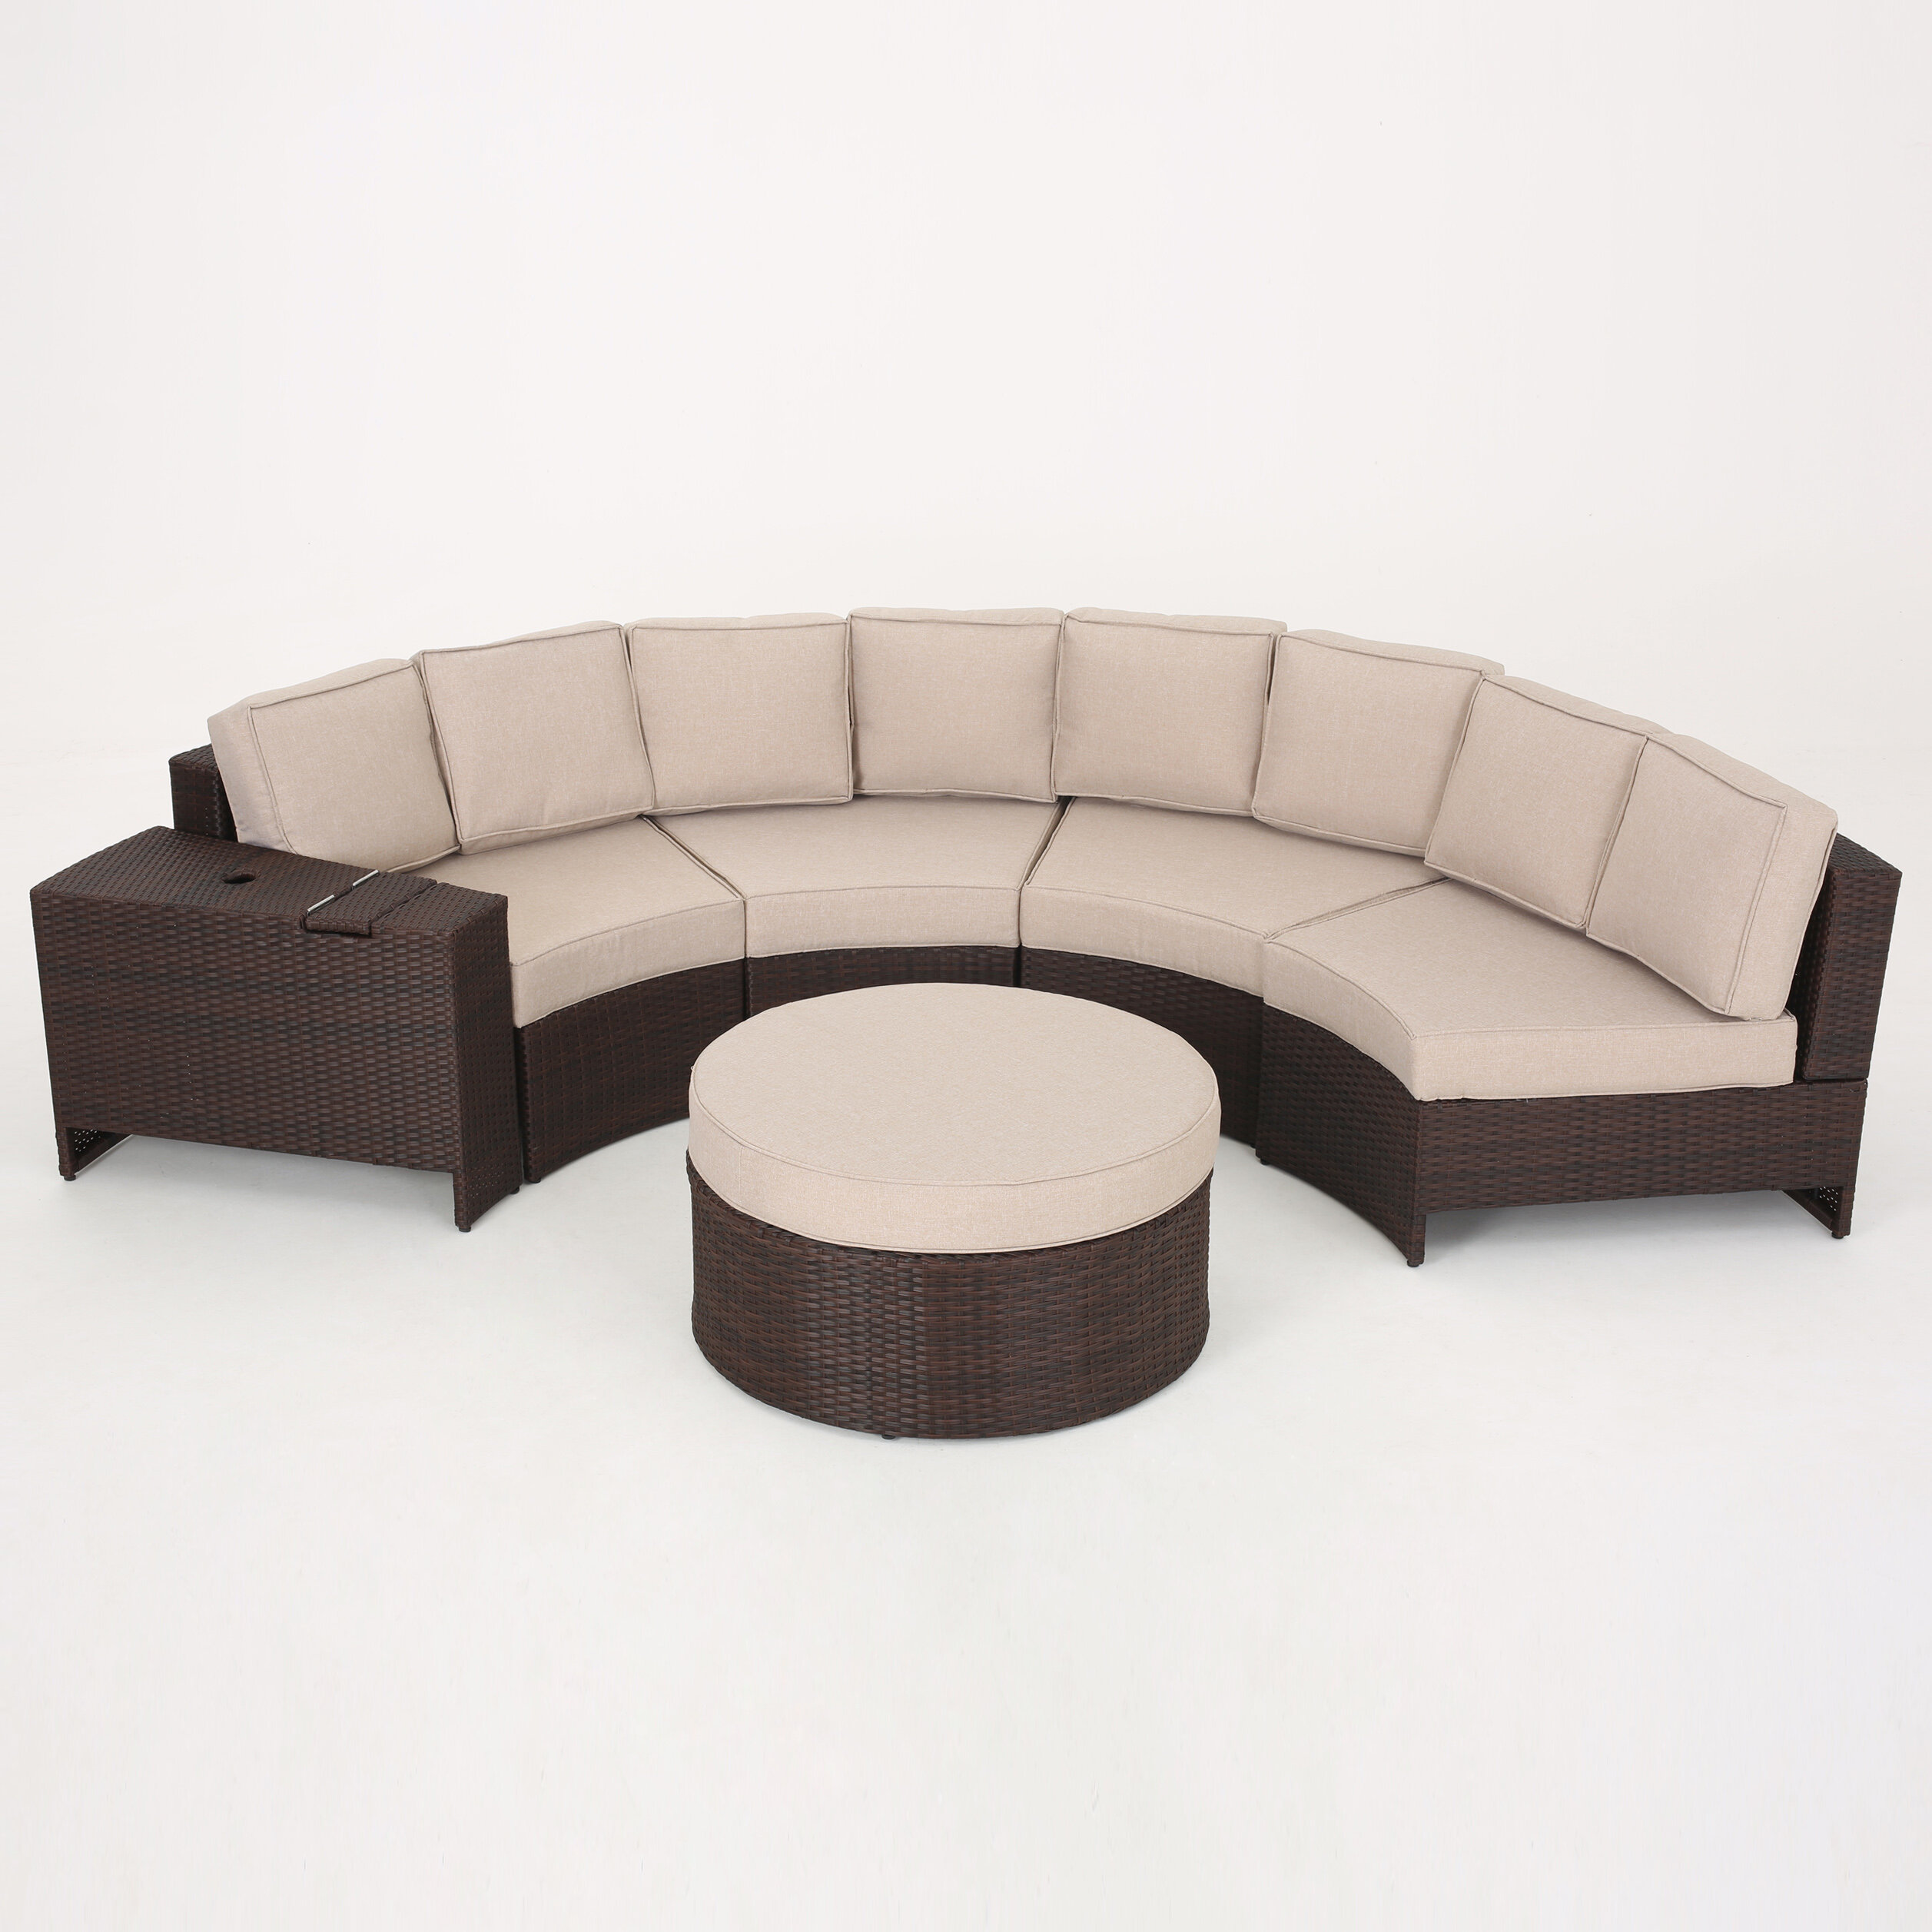 Bermuda 6 Piece Sectional Set with Cushions & Reviews   Joss & Main